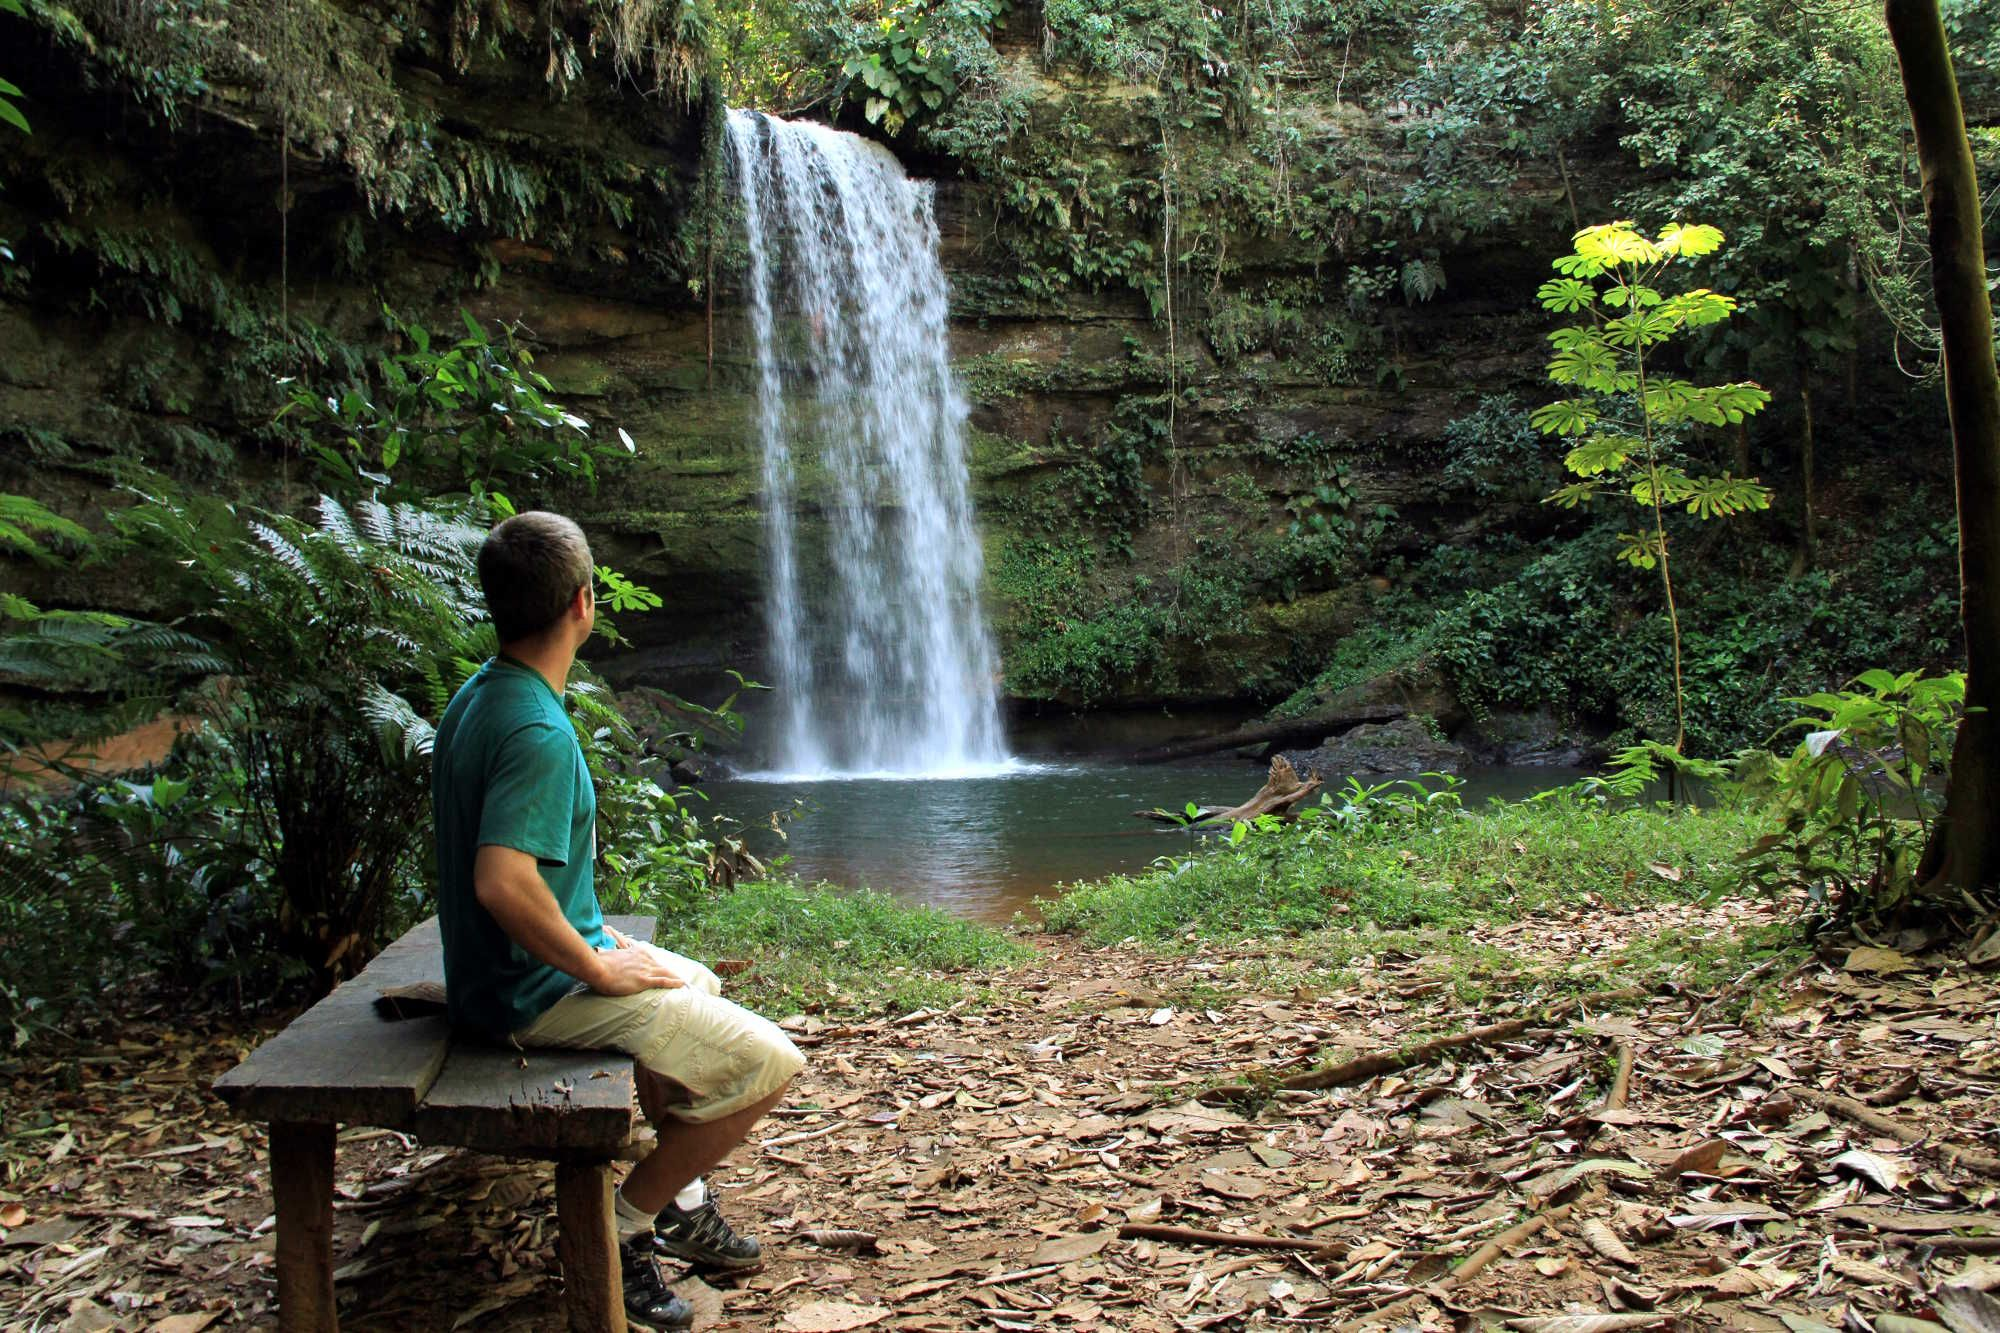 Cachoeira em Taguaruçu - Tocantins.